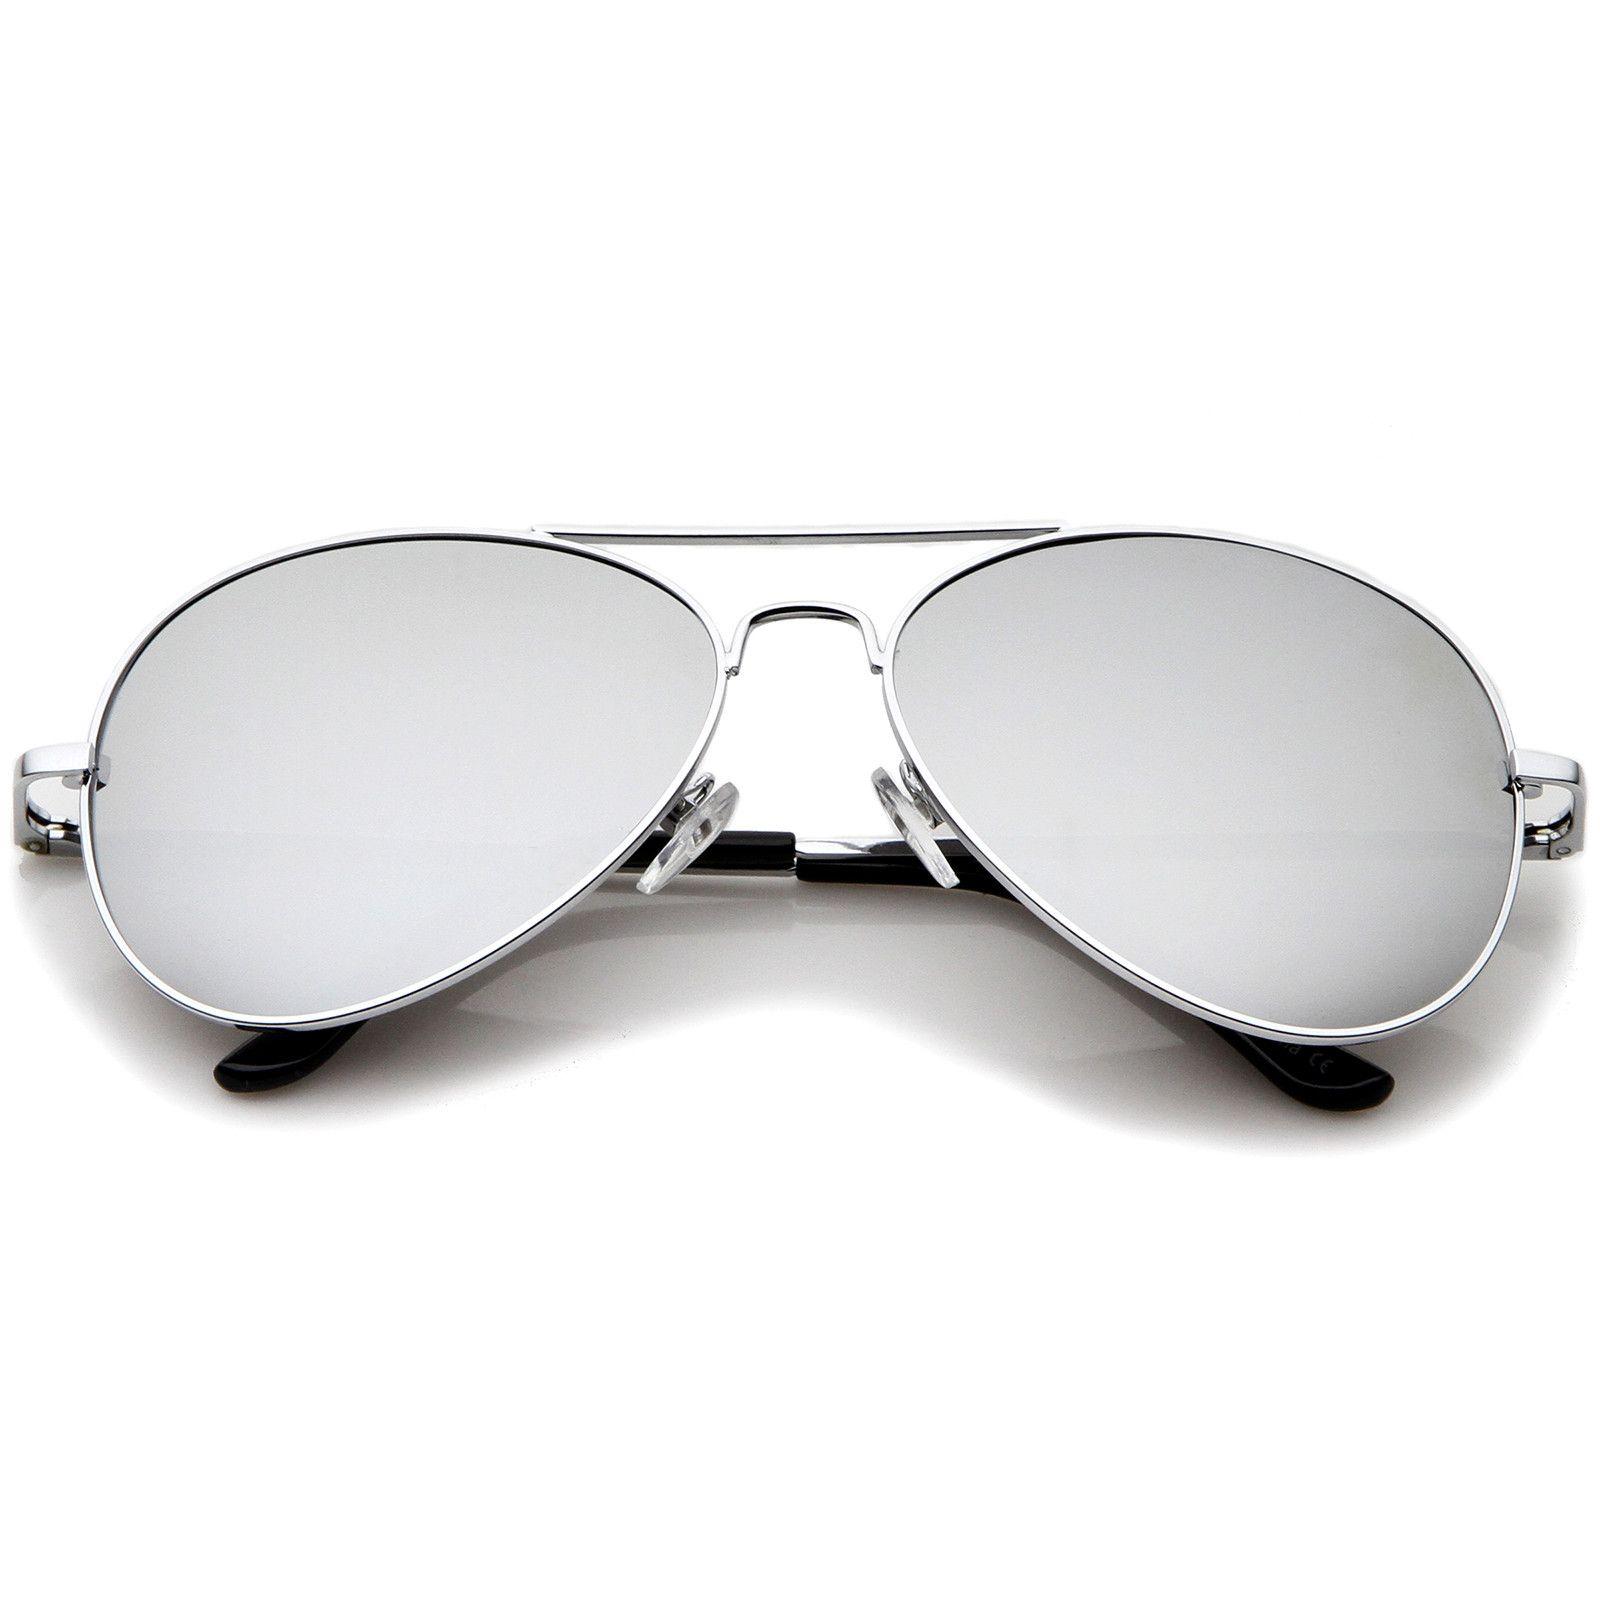 c266efed6f Classic Metal Frame Spring Hinges Color Mirror Lens Aviator Sunglasses 56mm   sunglassla  sunglass  mirrored  bold  womens  sunglasses  summer  clear   purple ...